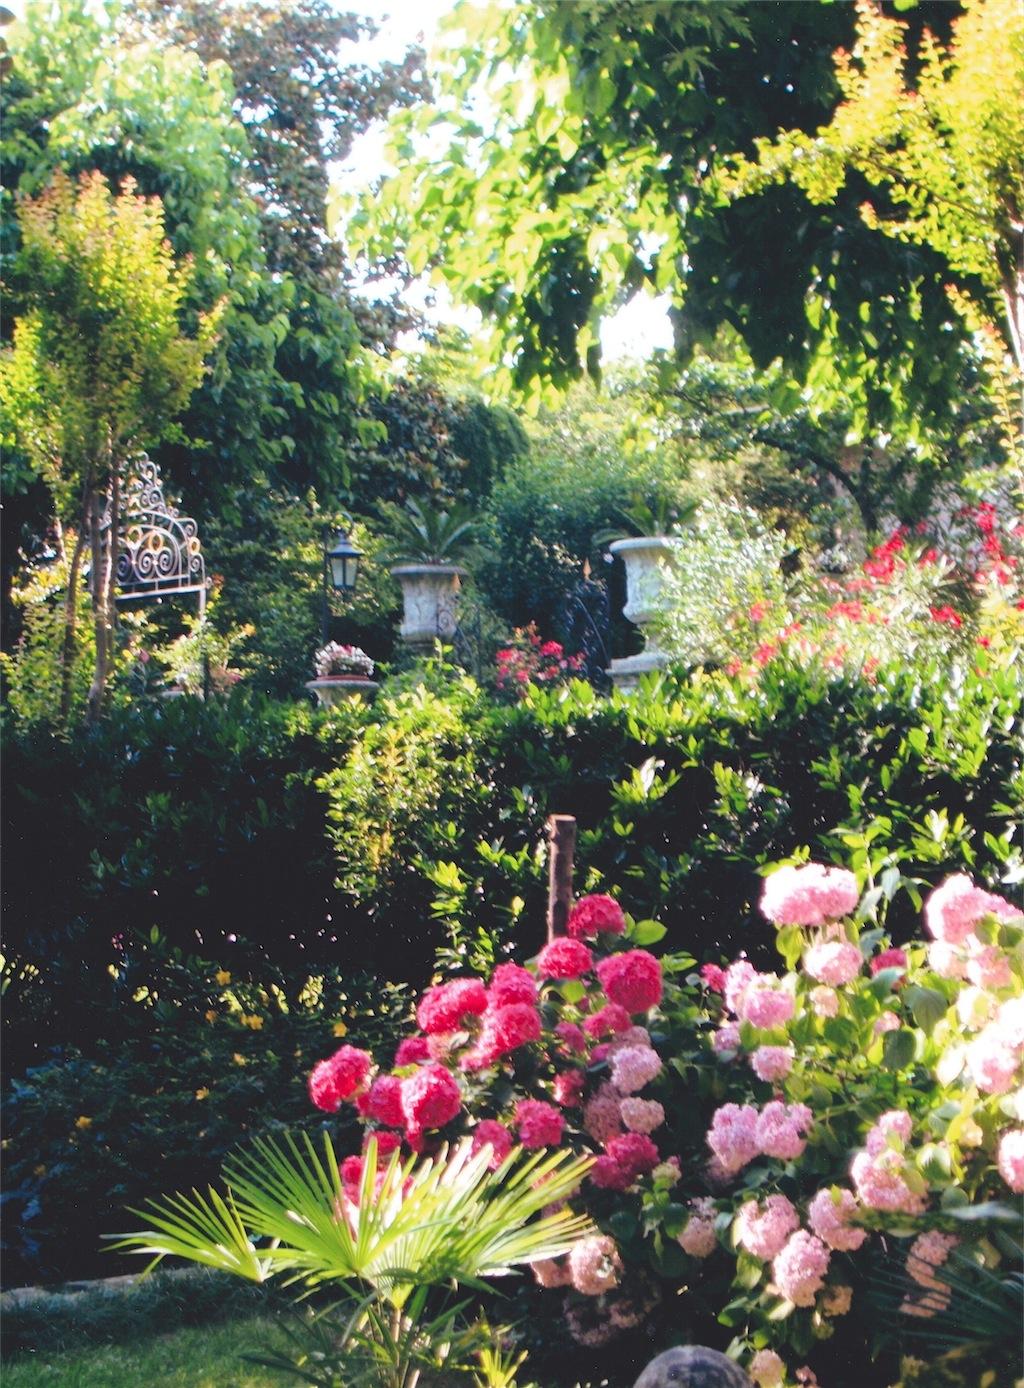 Il giardino di roberta amici in giardino - Il giardino di ausonia ...